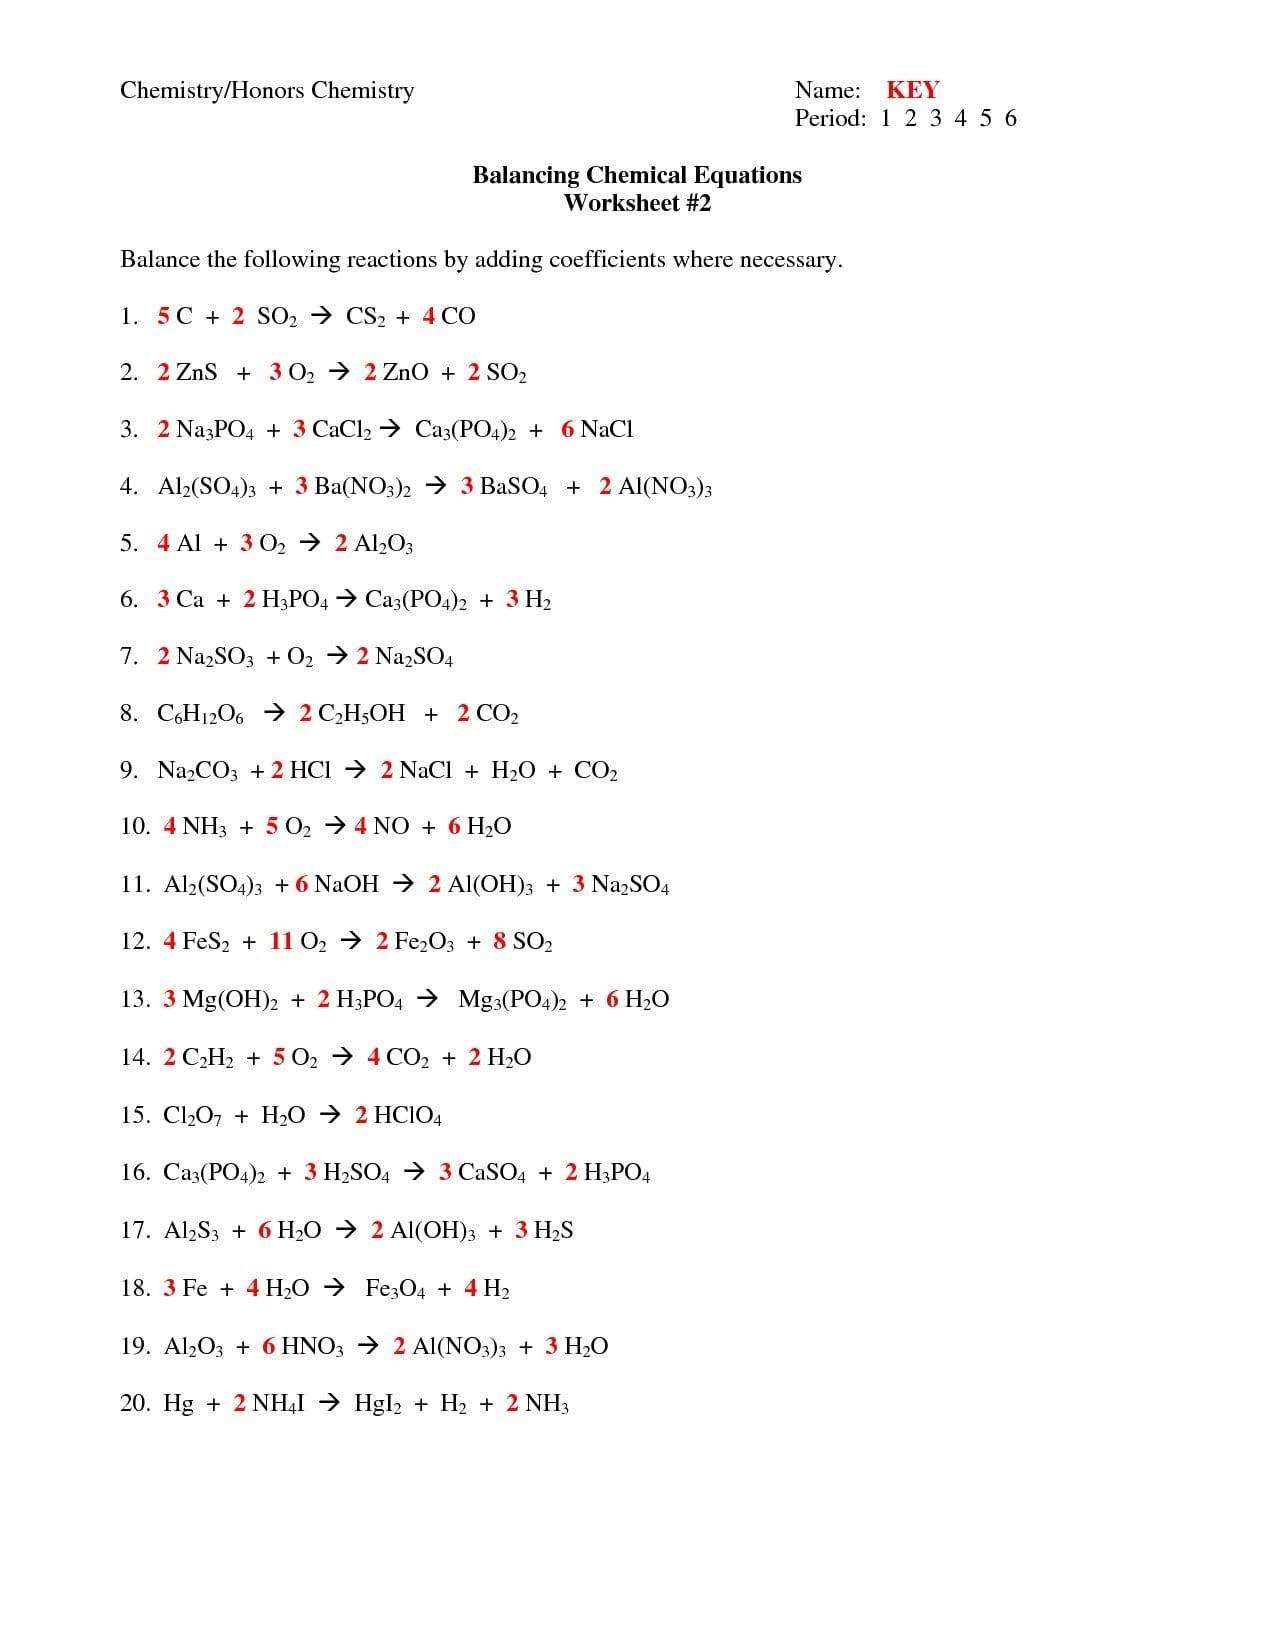 Chapter 7 Worksheet 1 Balancing Chemical Equations